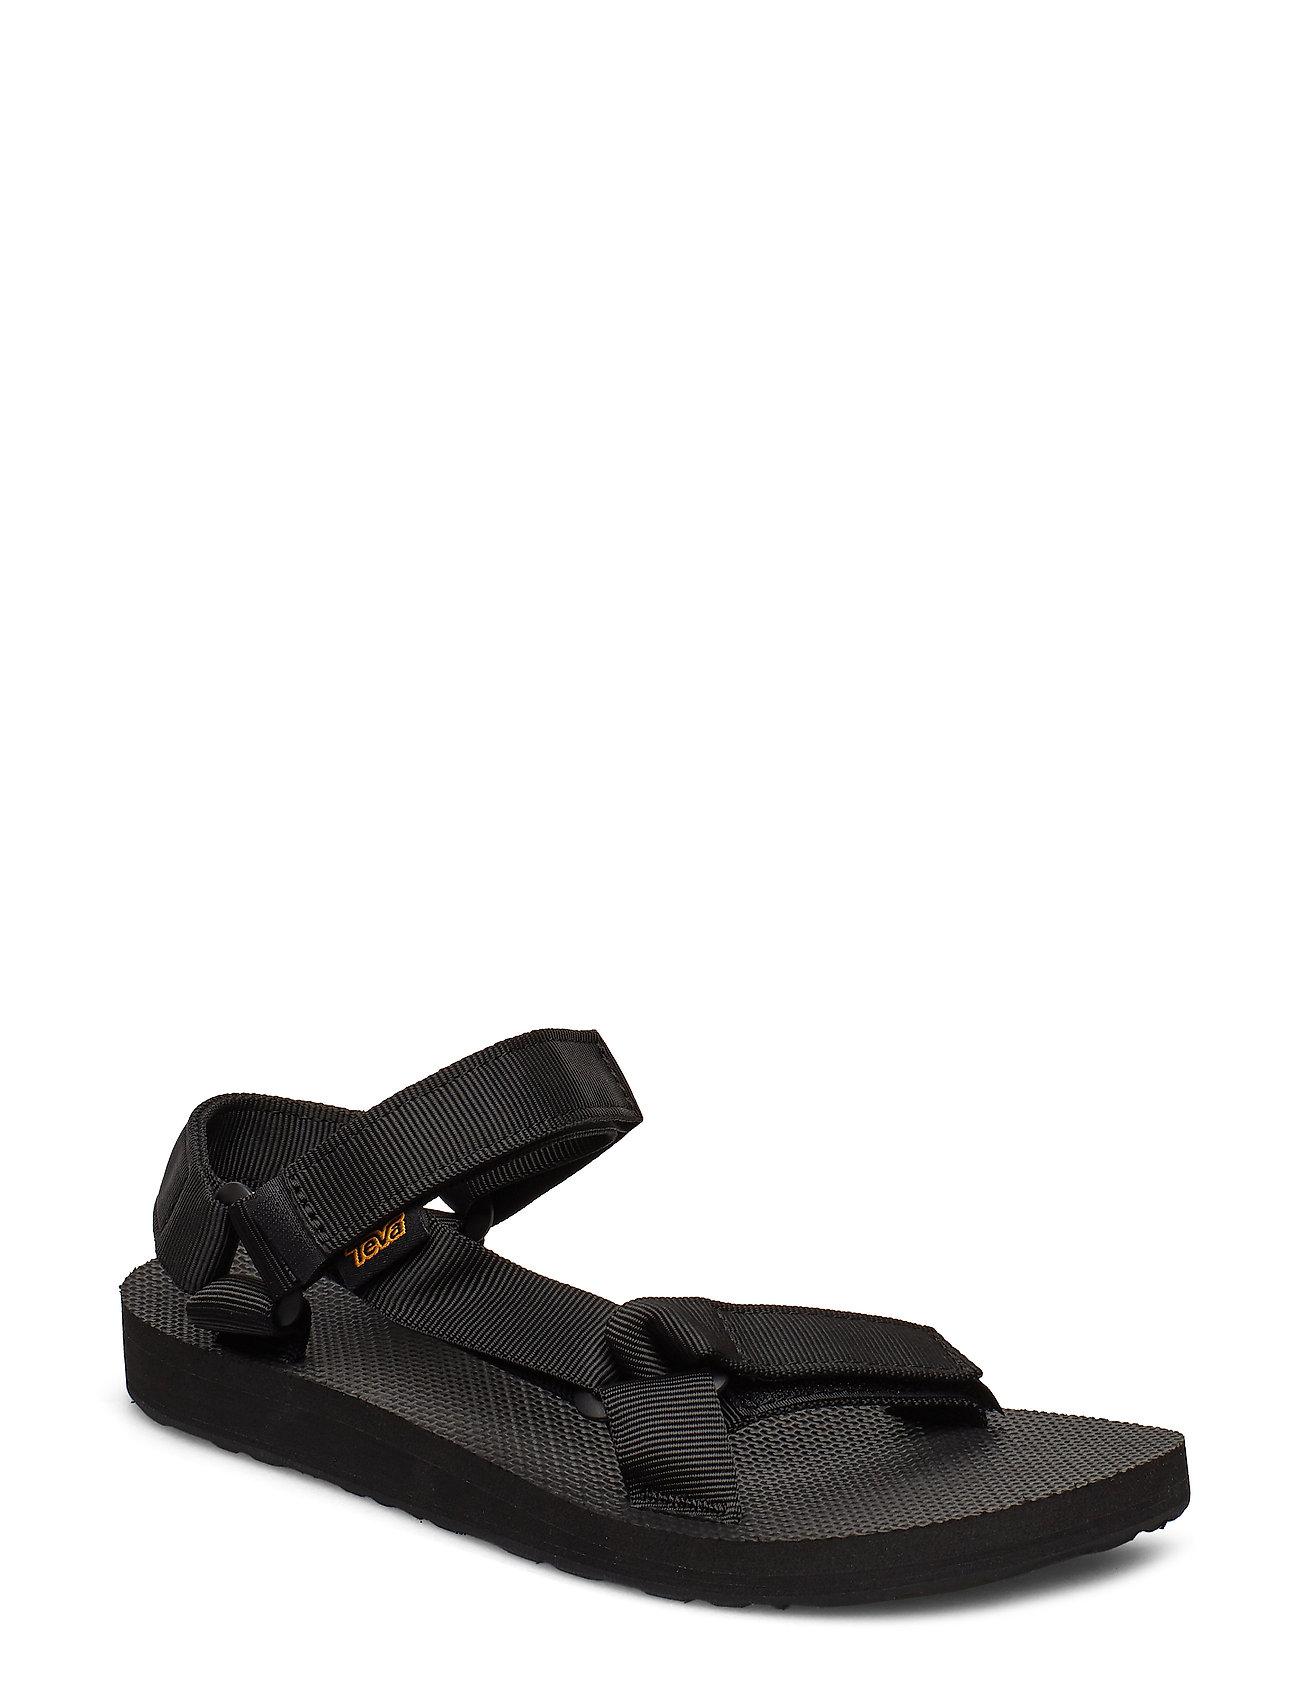 Teva Original Universal sandals in white | ASOS | Teva